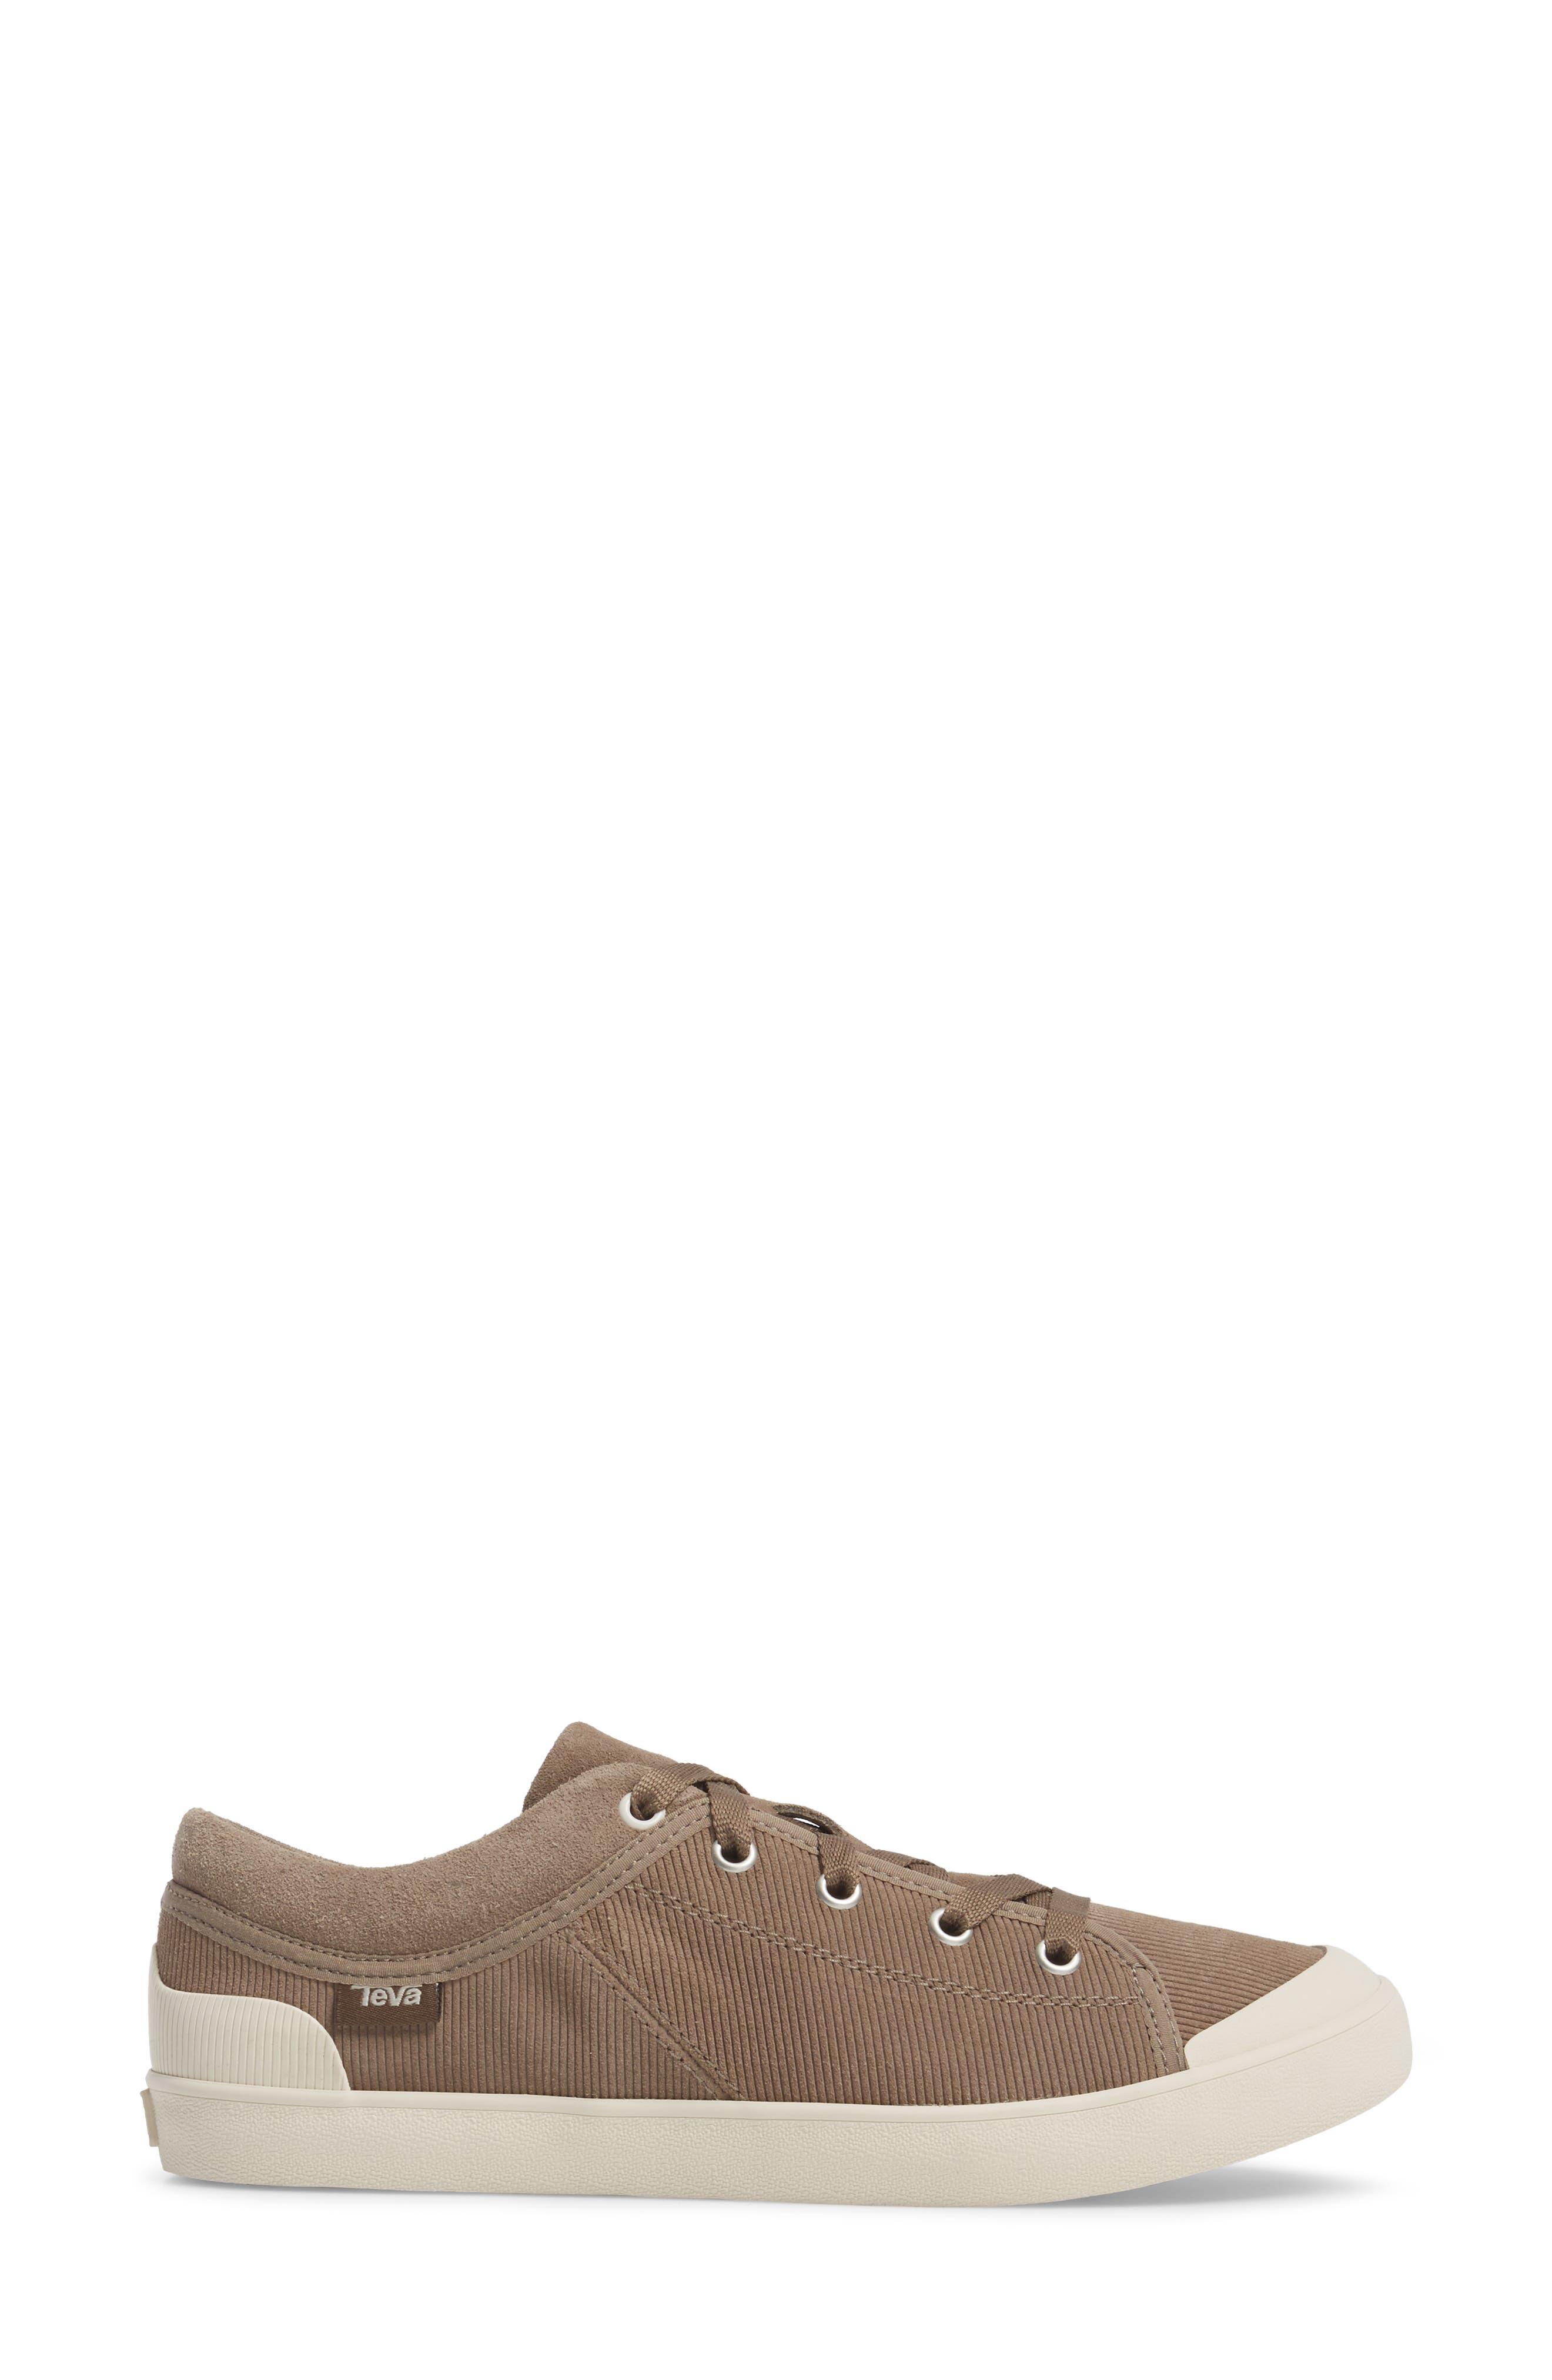 Freewheel Sneaker,                             Alternate thumbnail 3, color,                             240